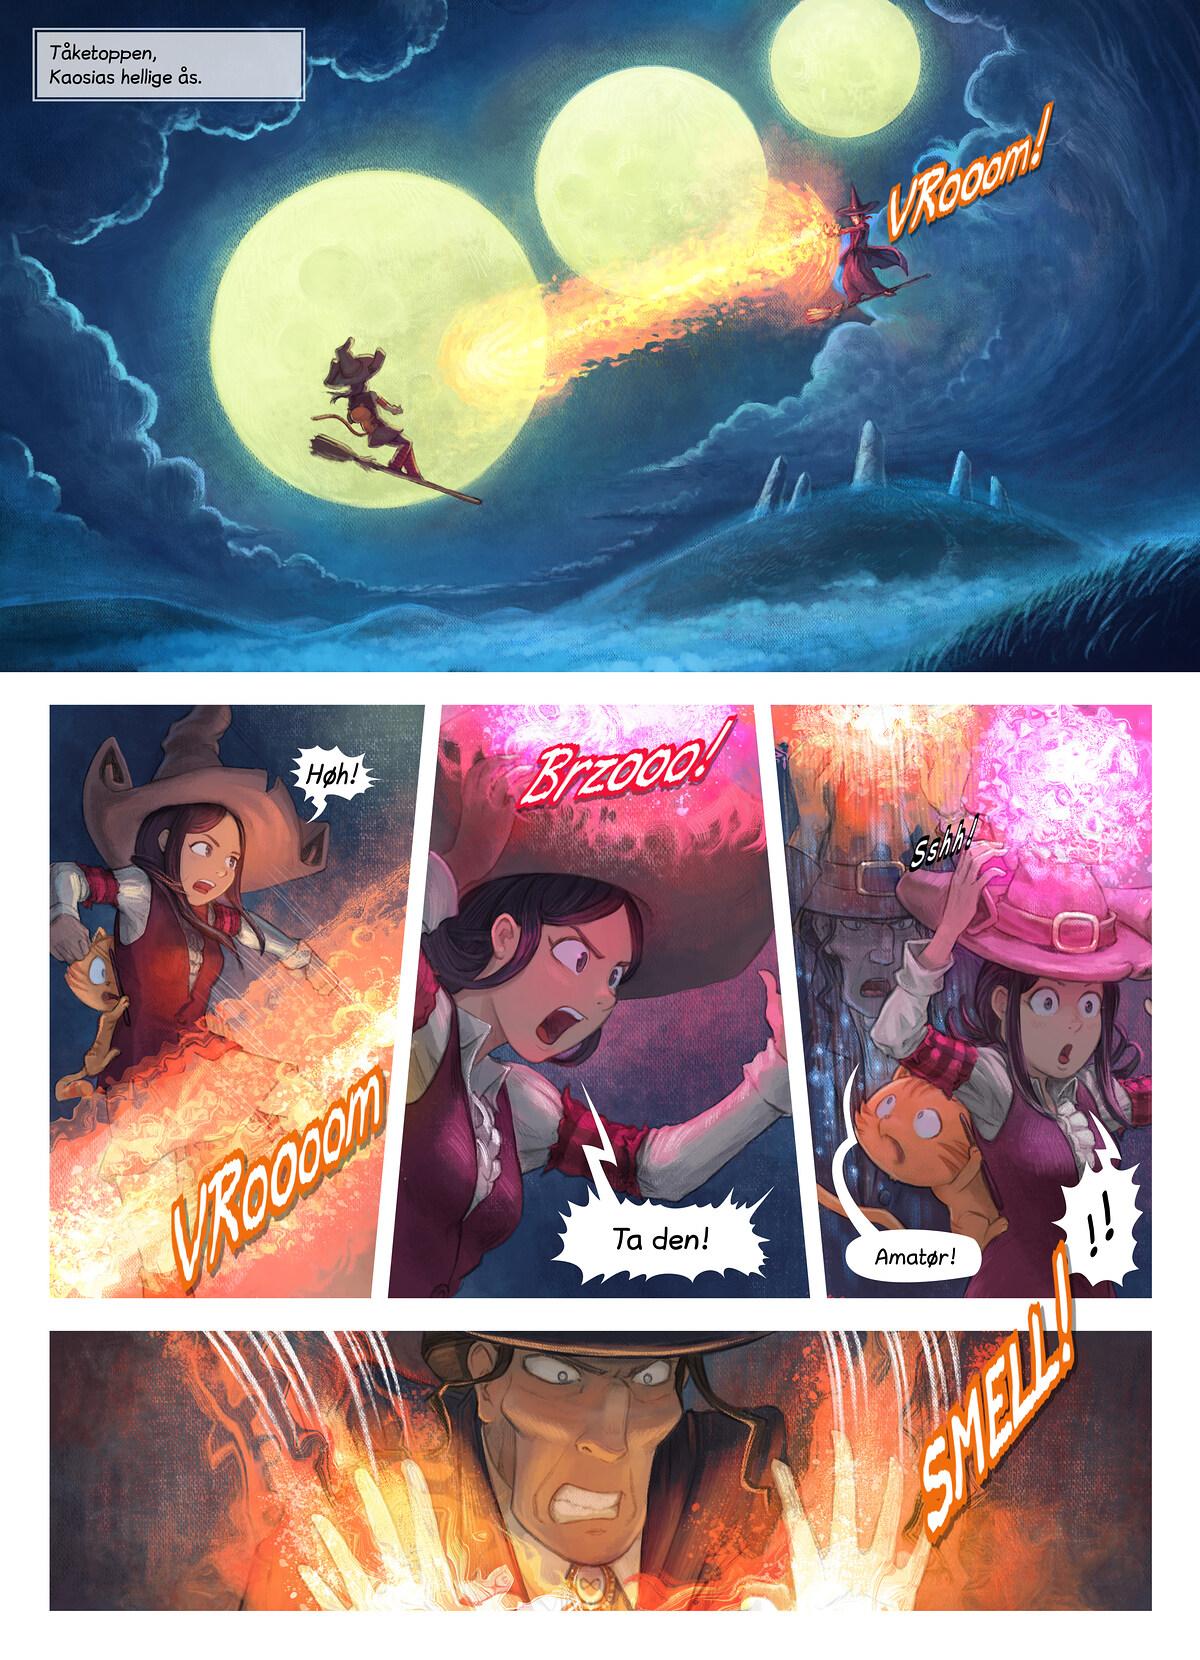 Episode 31: Den store kampen, Page 1